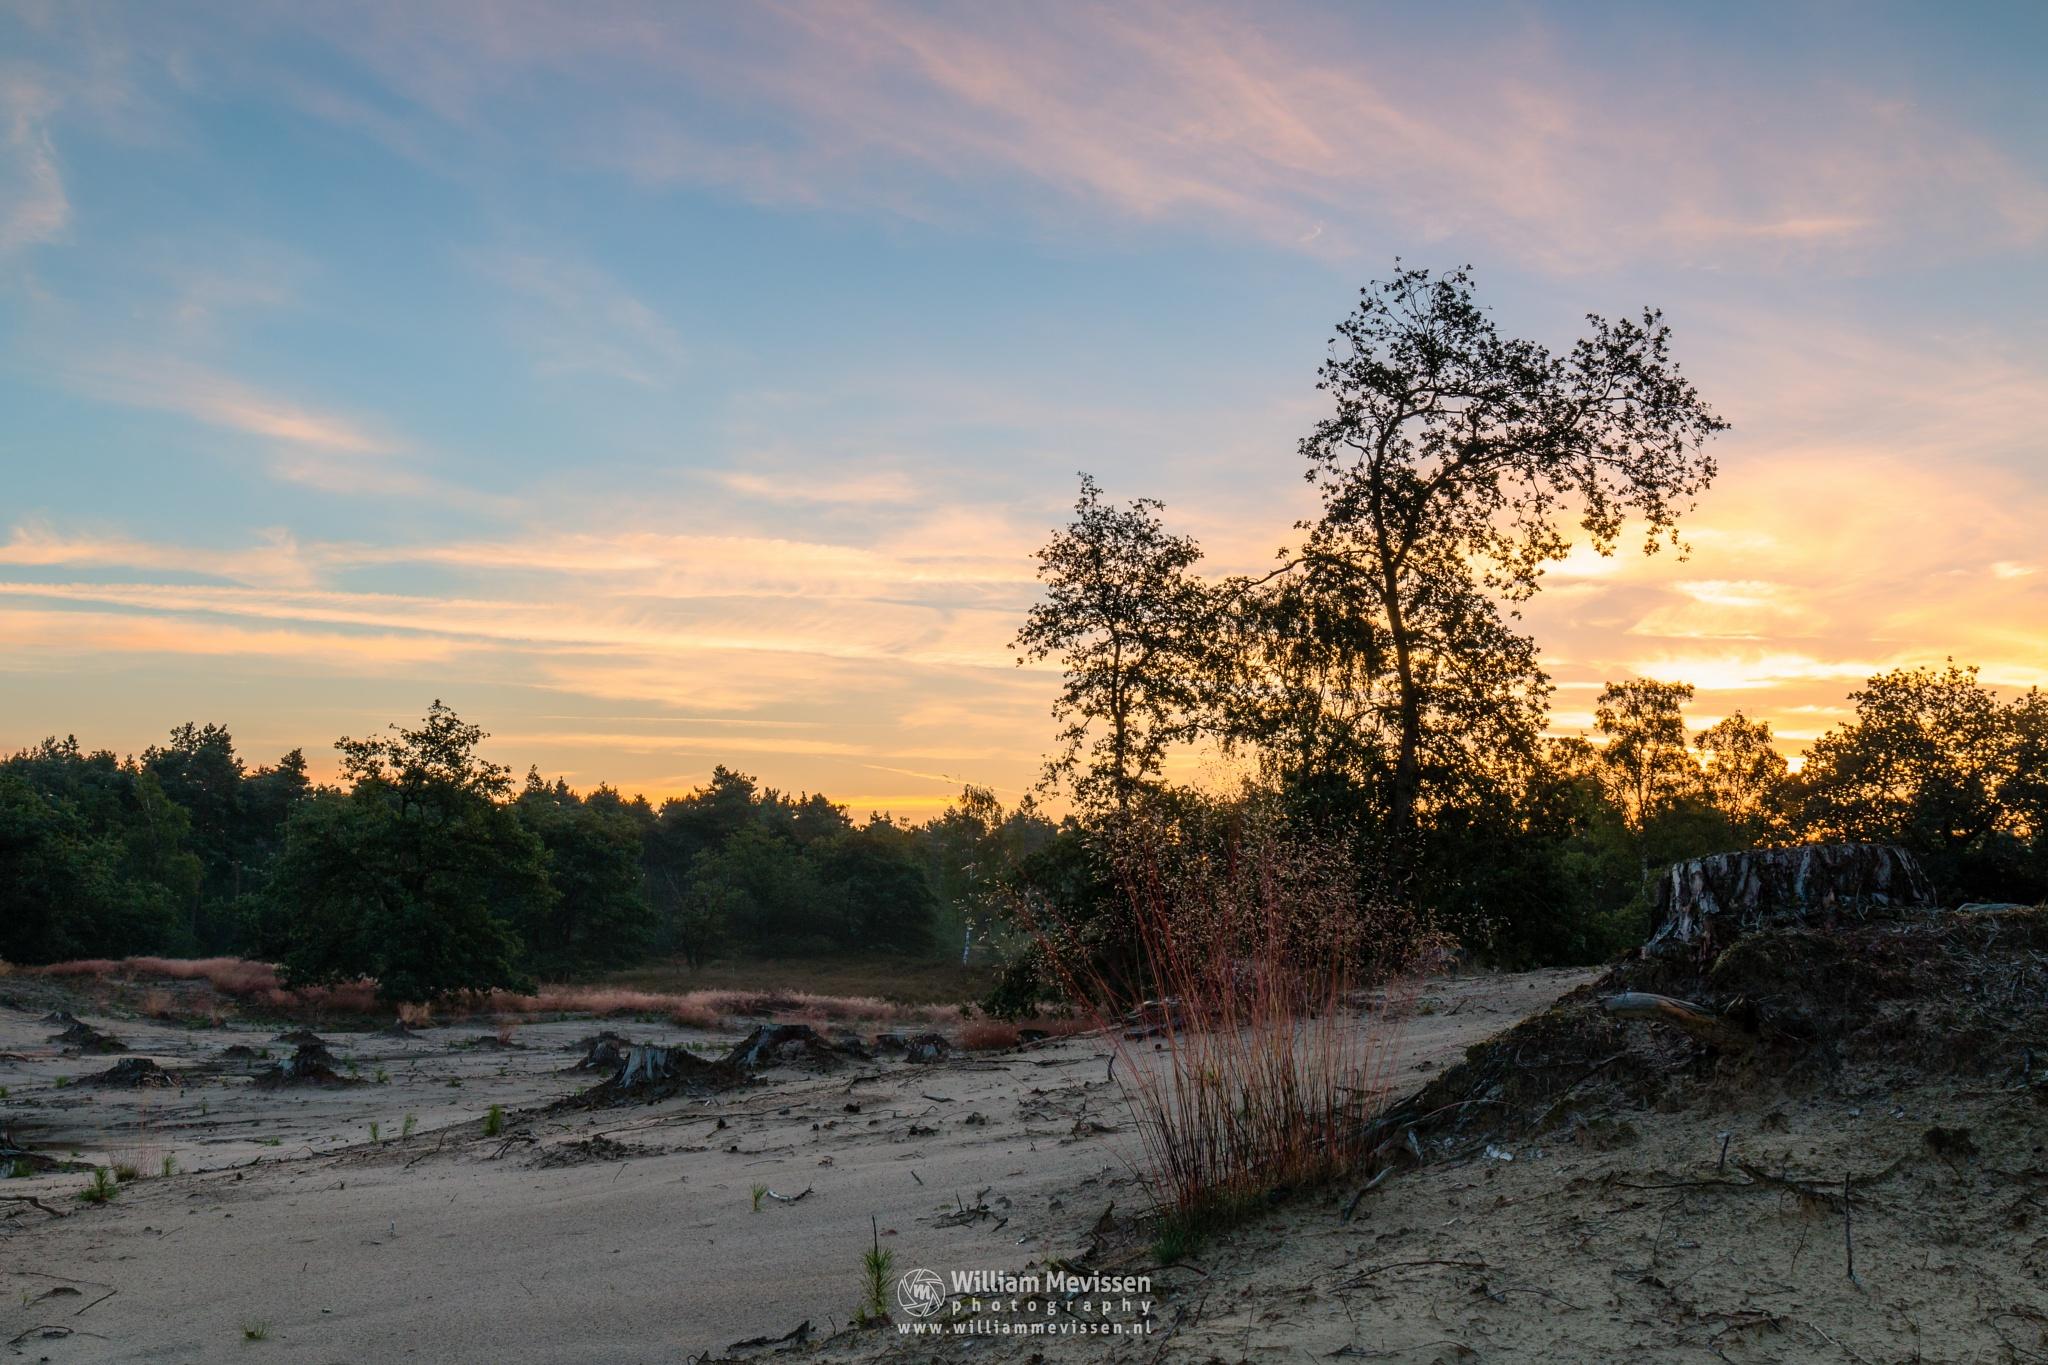 Sunrise Silhouettes & Colors by William Mevissen